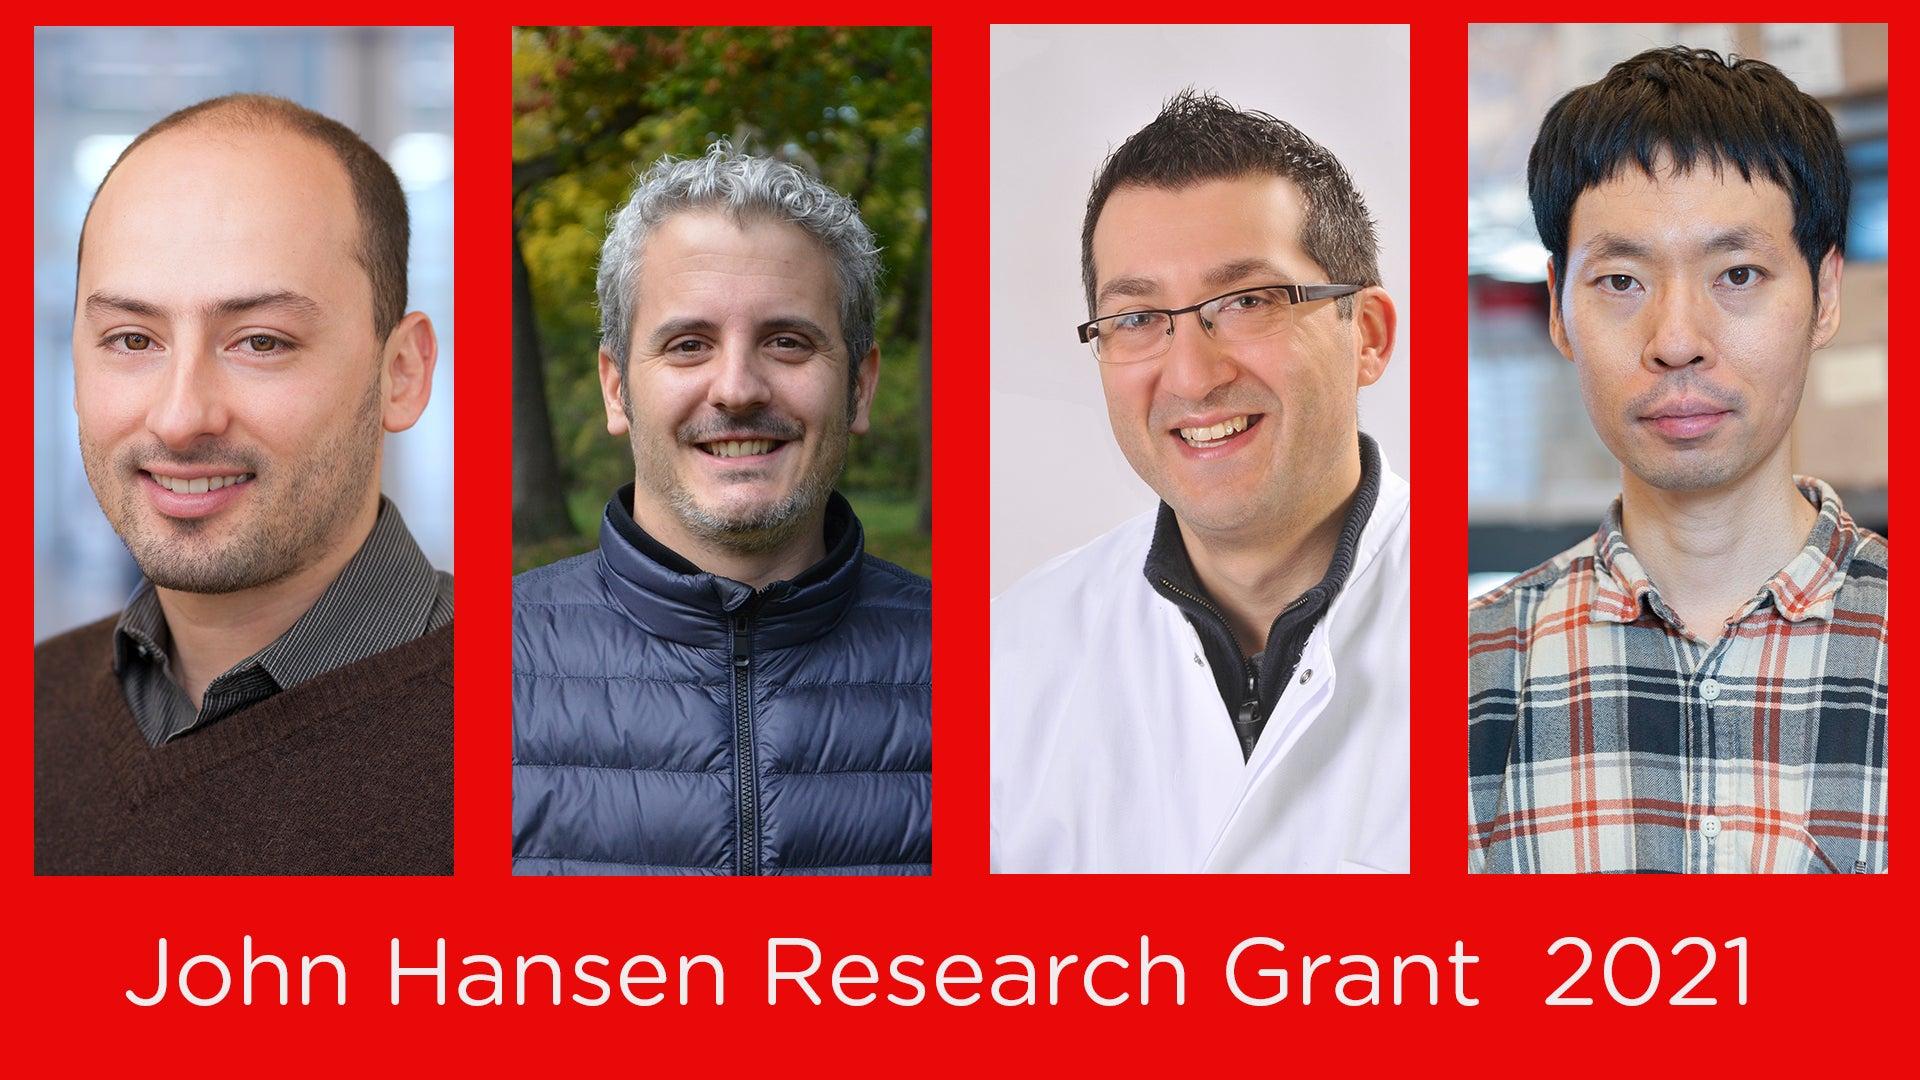 John Hansen Research Grant Awardess 2021